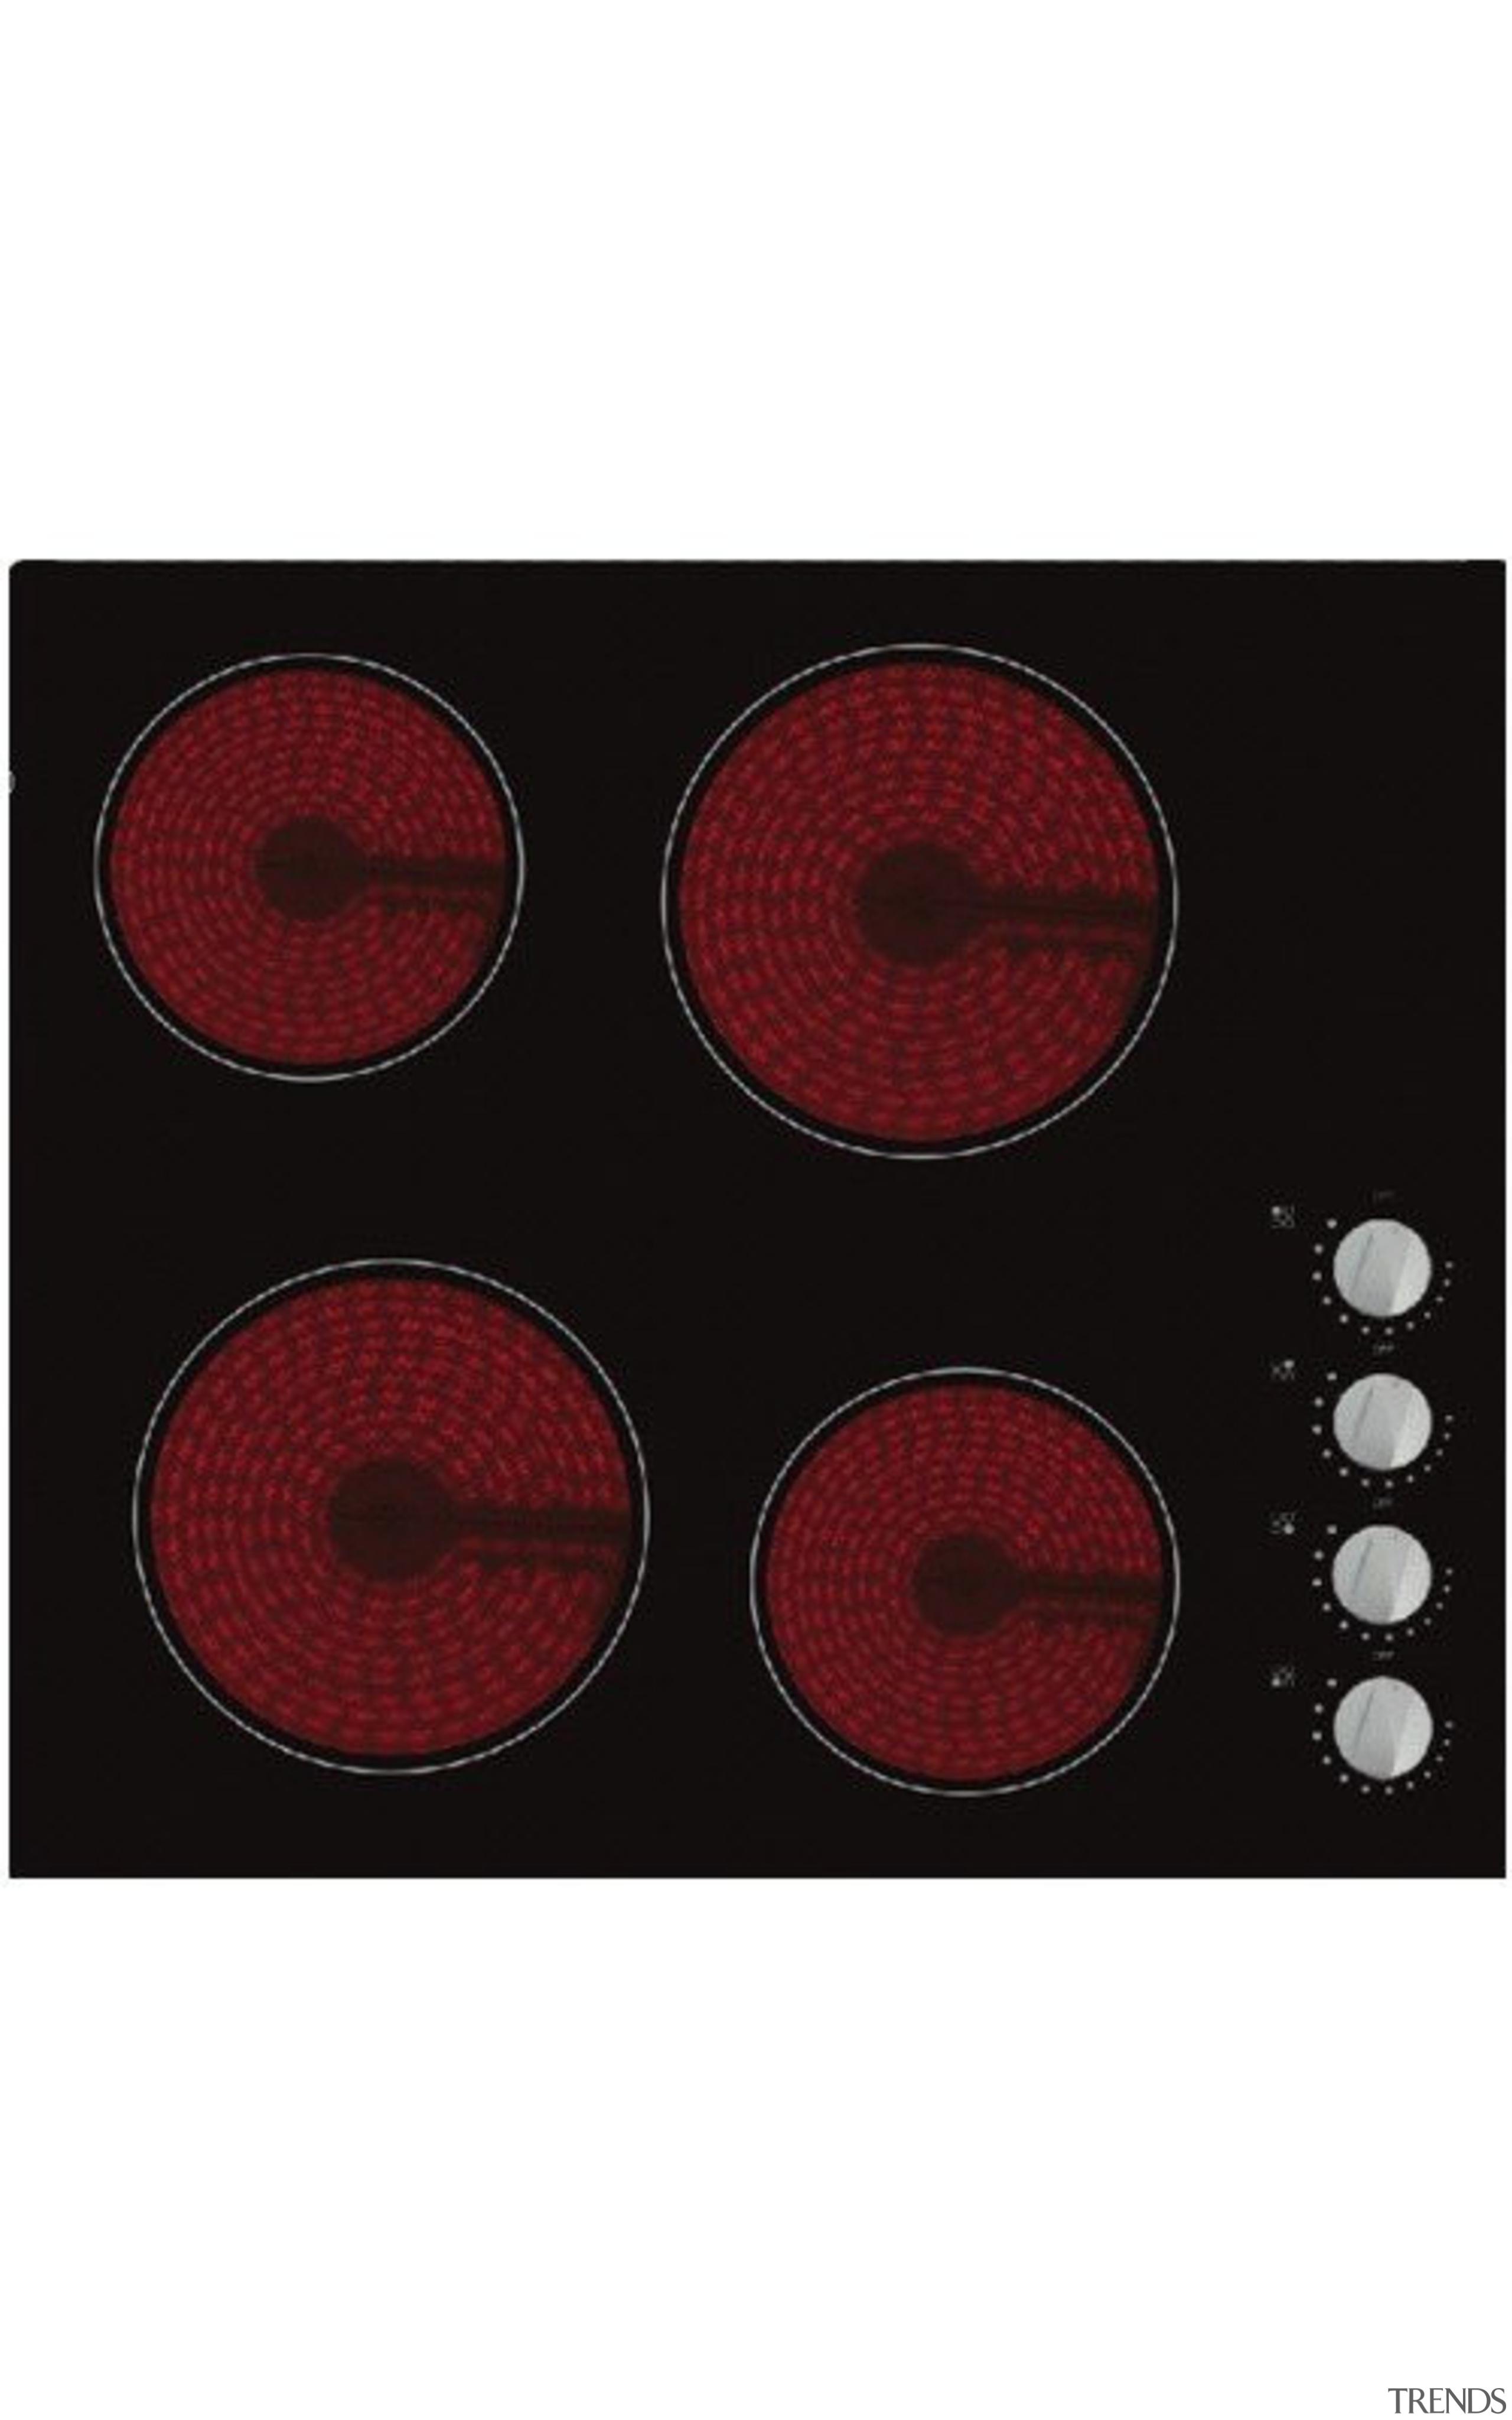 60cm Ceramic CooktopKnob control, Timer, Residual heat indicator, automotive tail & brake light, product, red, white, black